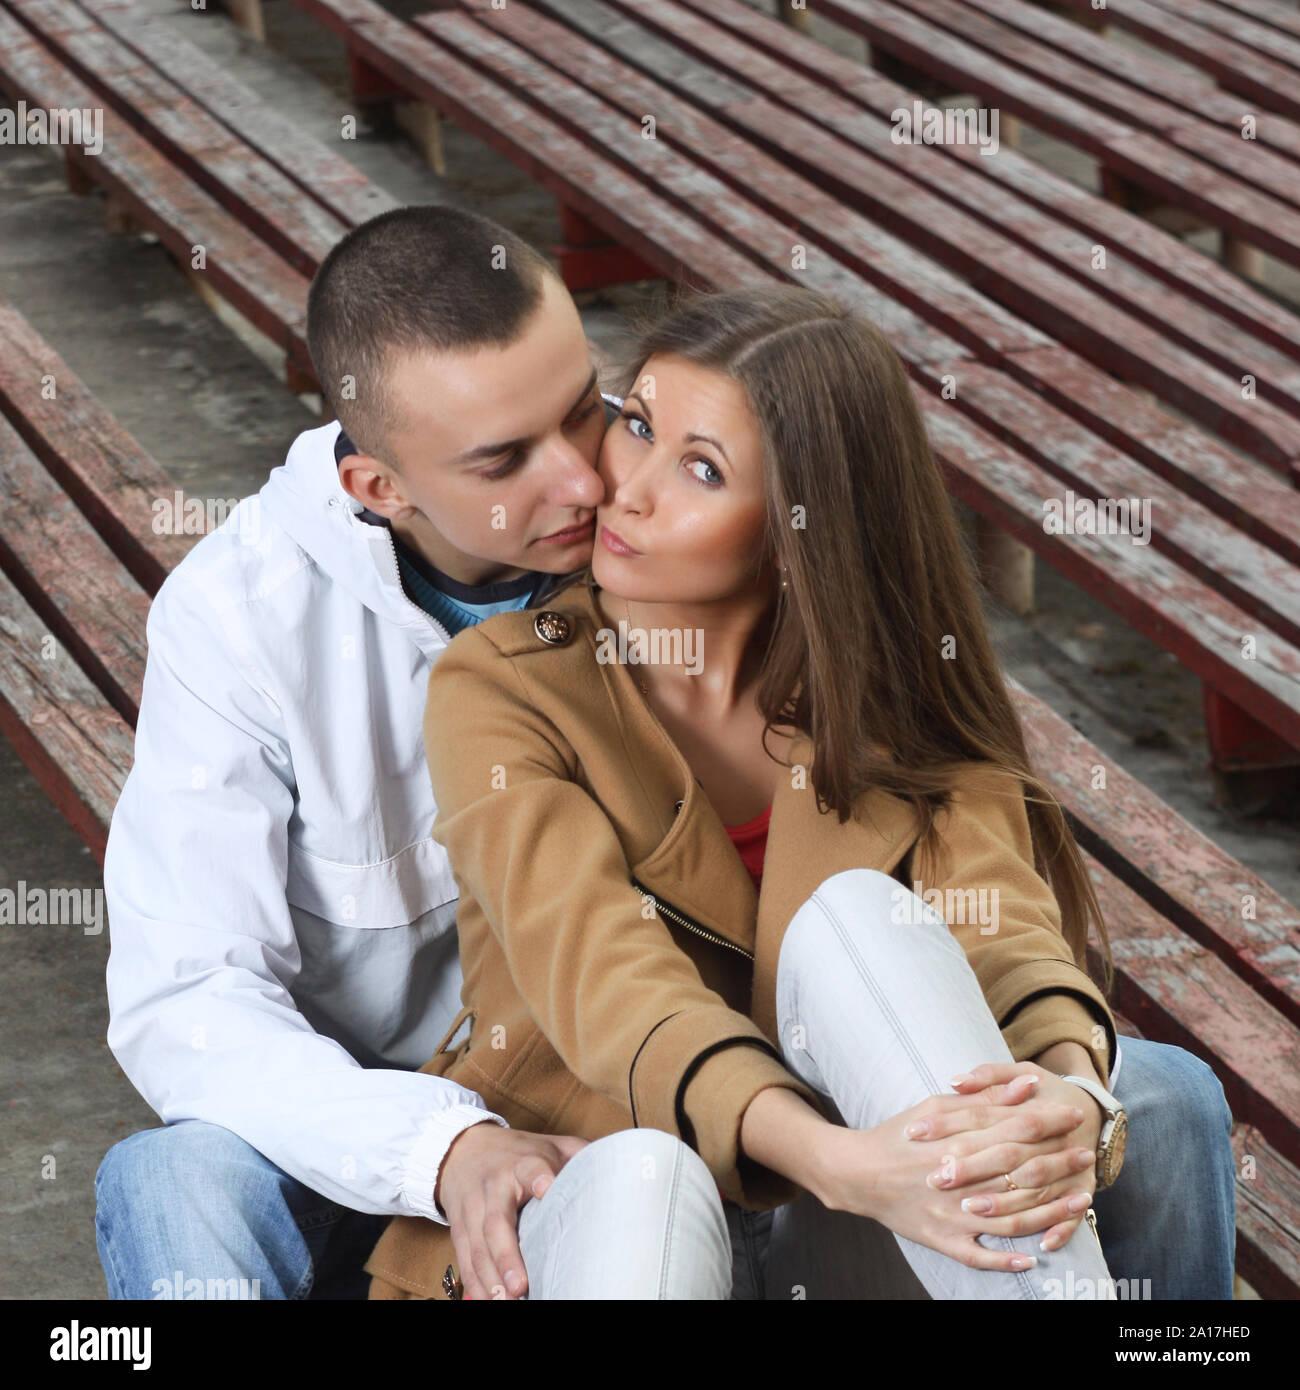 browns stadia van dating